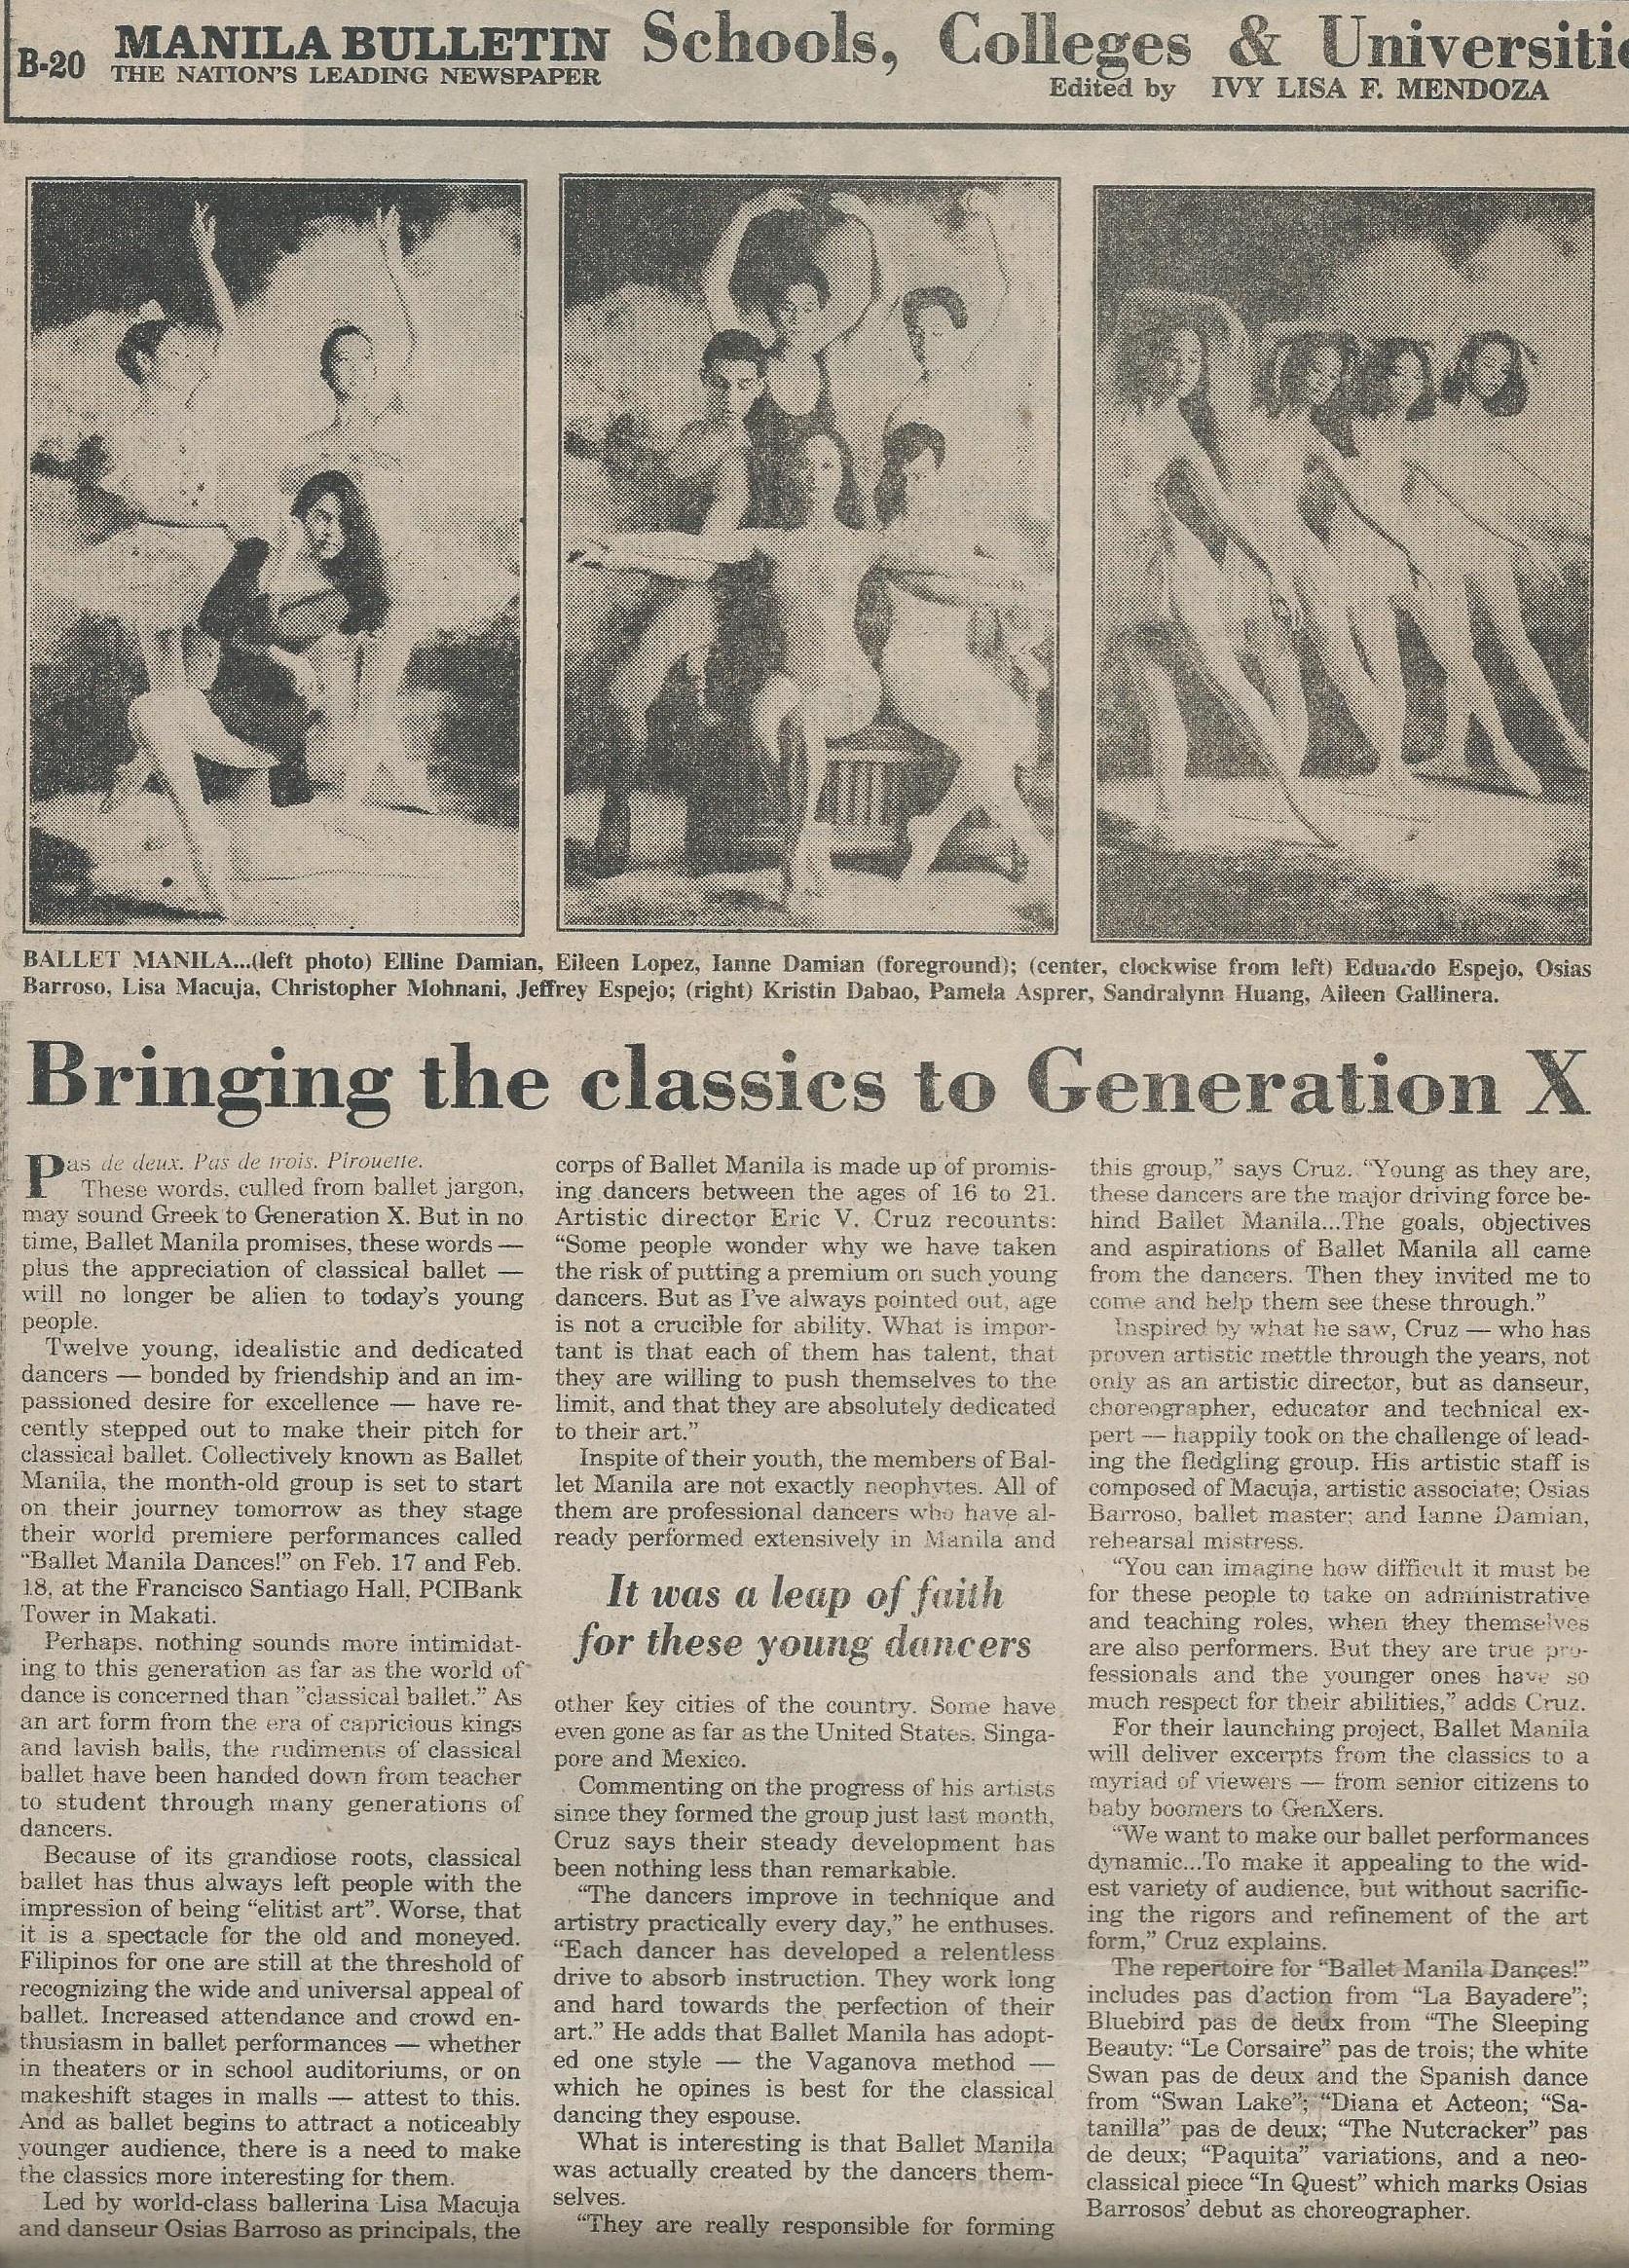 Bringing the classics to Generation X